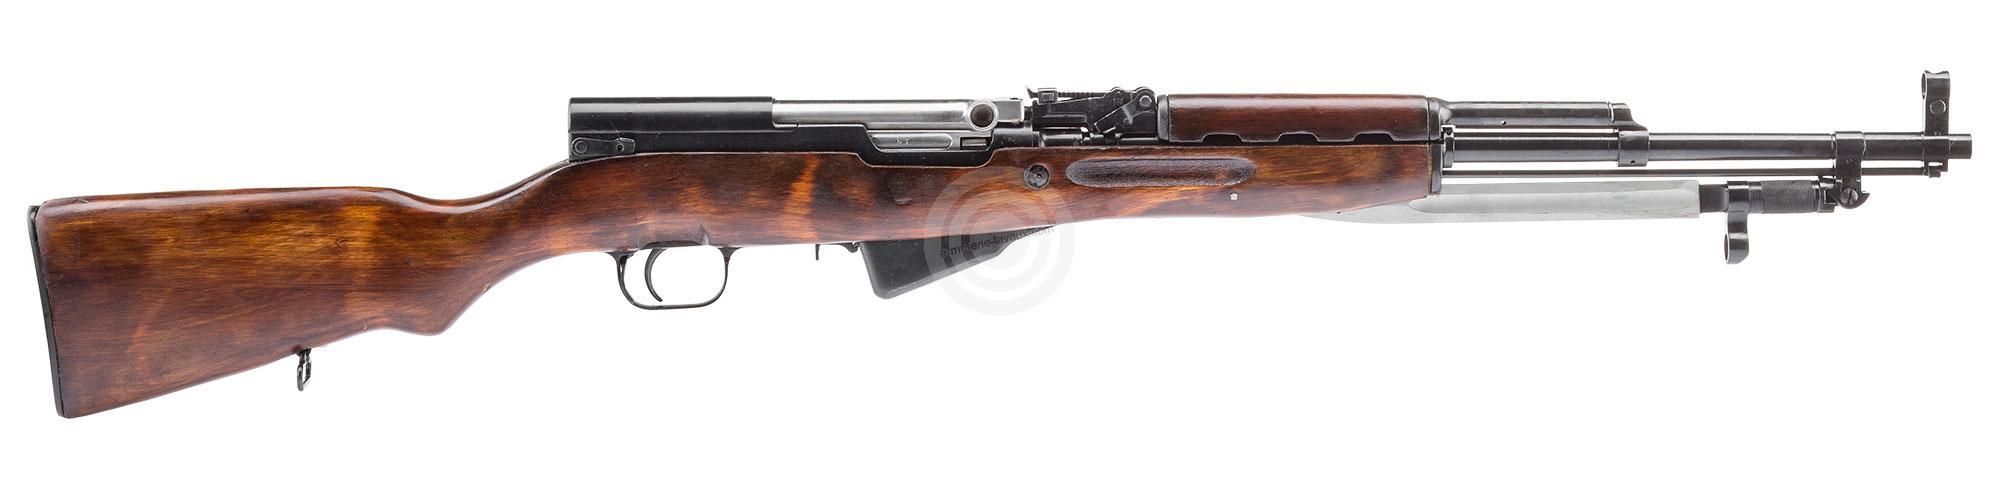 Carabine SKS 45 cal.7.62x39